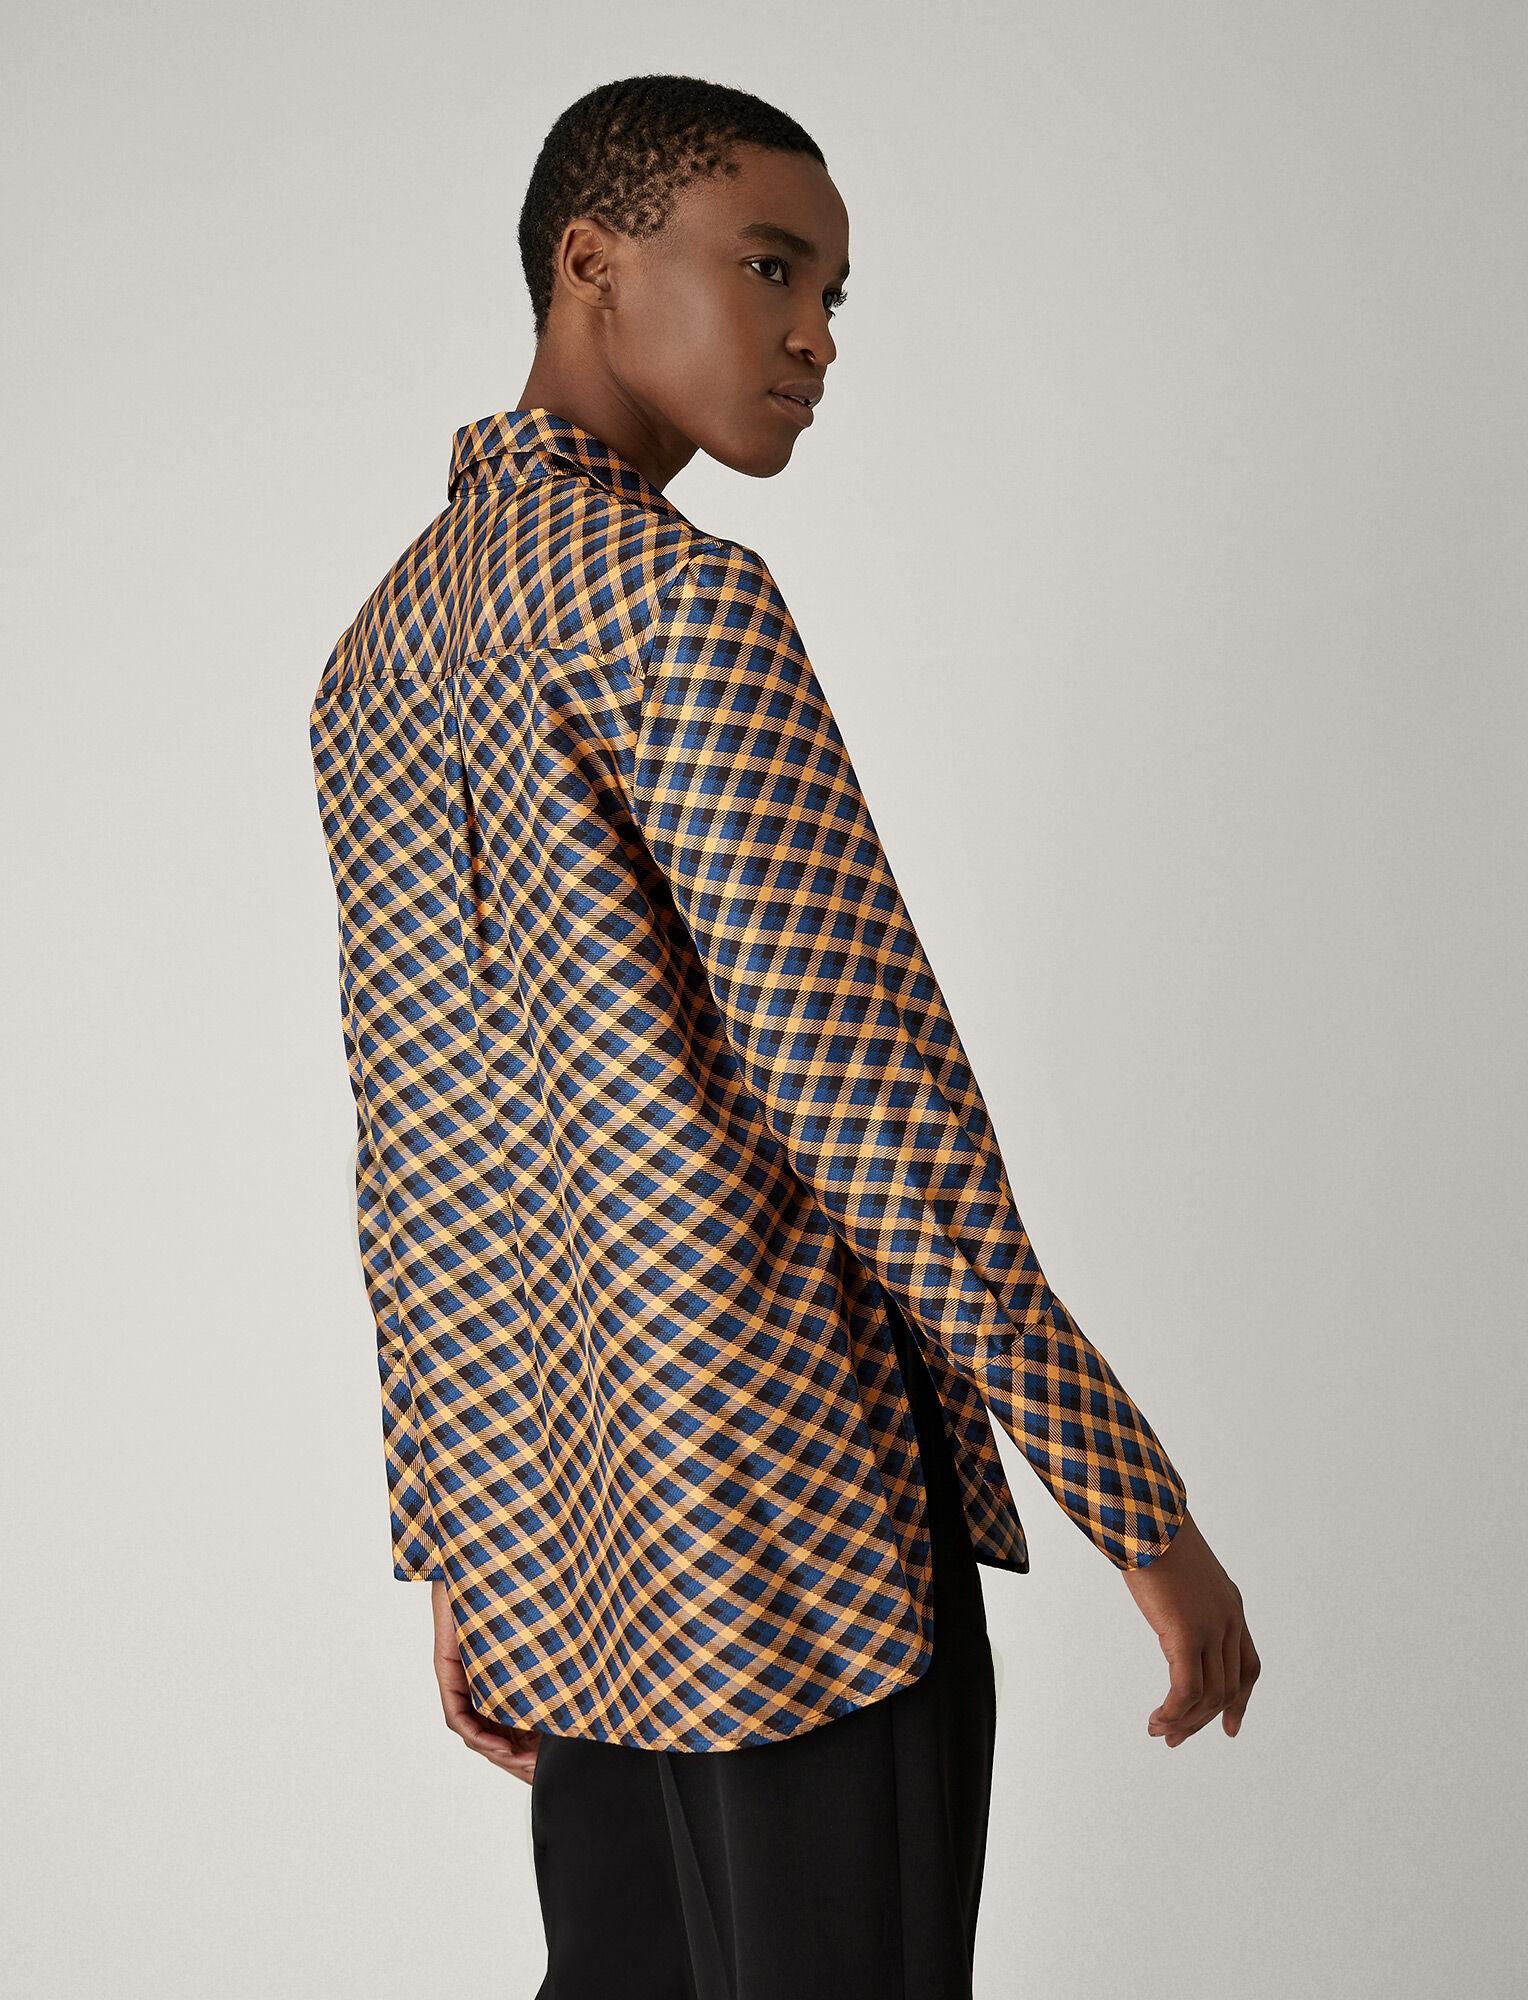 Joseph, Mason Diamond Weave Print Blouse, in PEACH